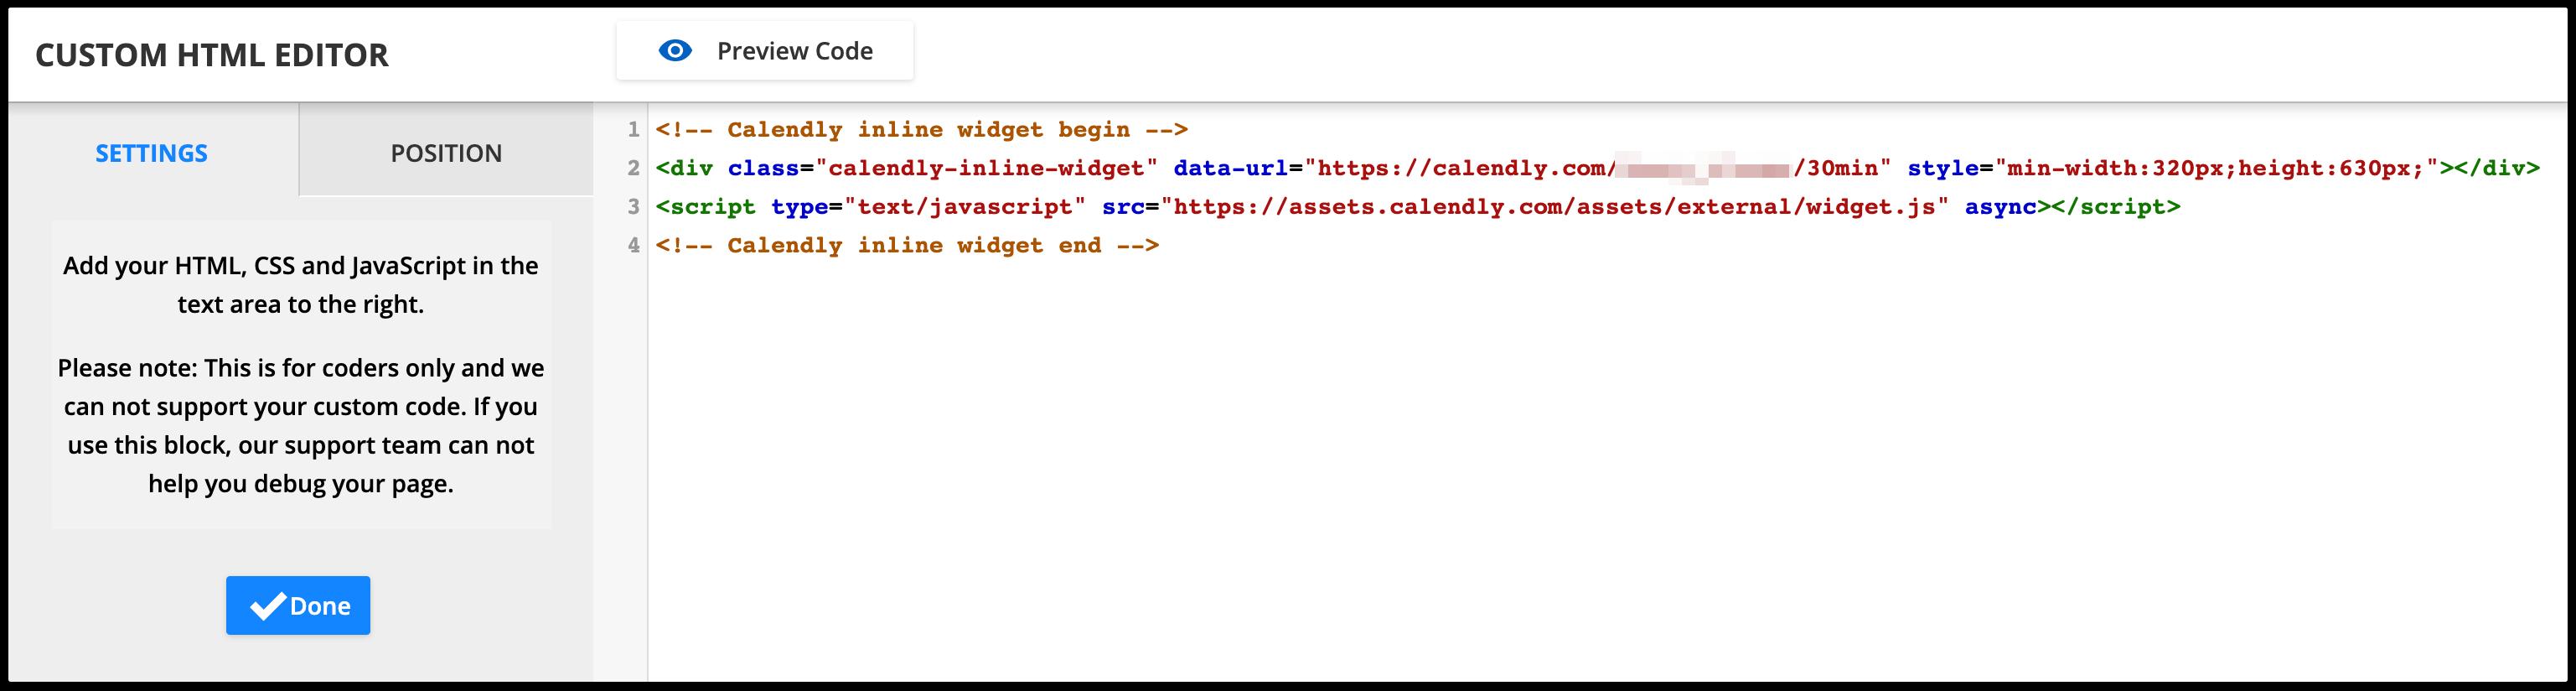 custom html code editor example image